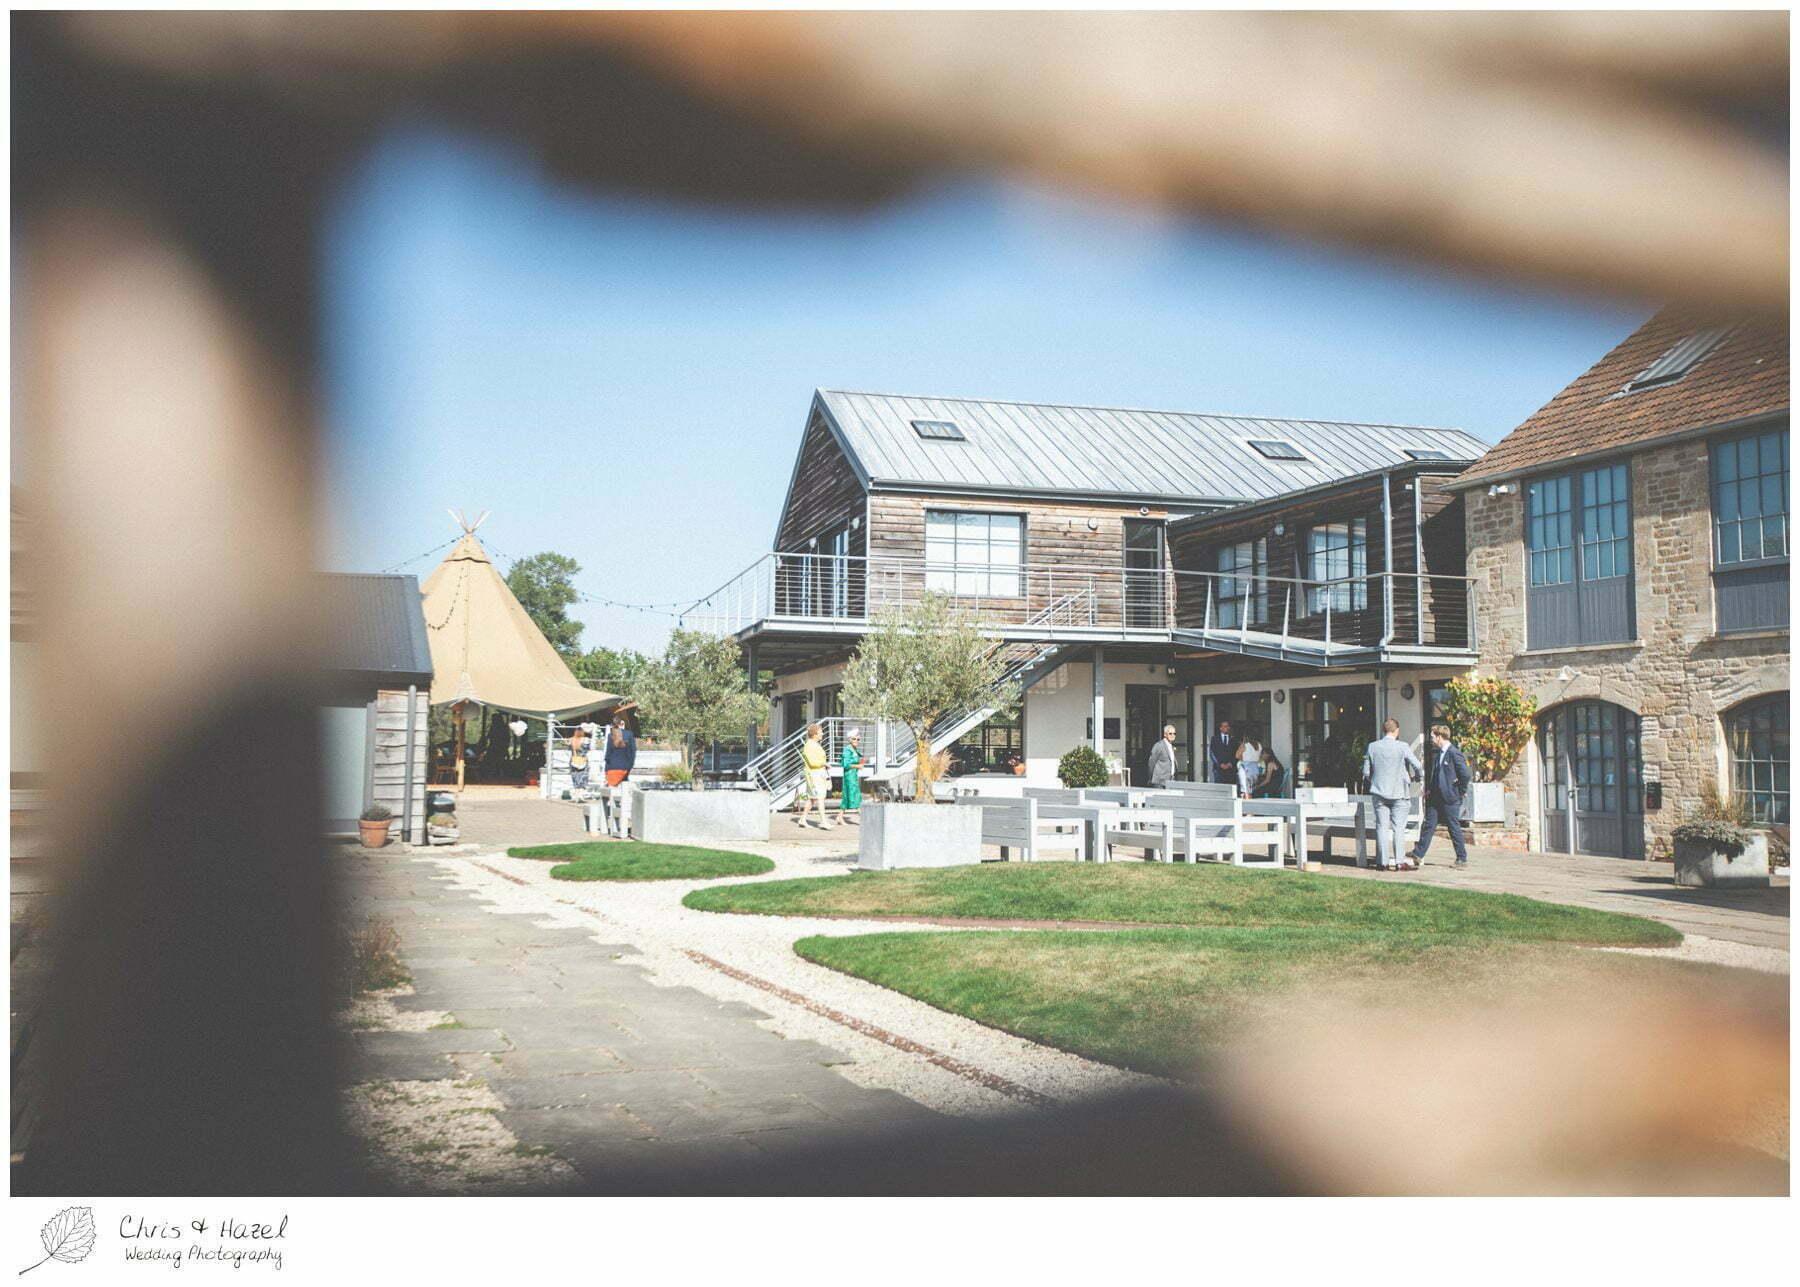 The Glove Factory Wedding Photography, Wiltshire Wedding Photographer Trowbridge, Chris and Hazel Wedding Photography